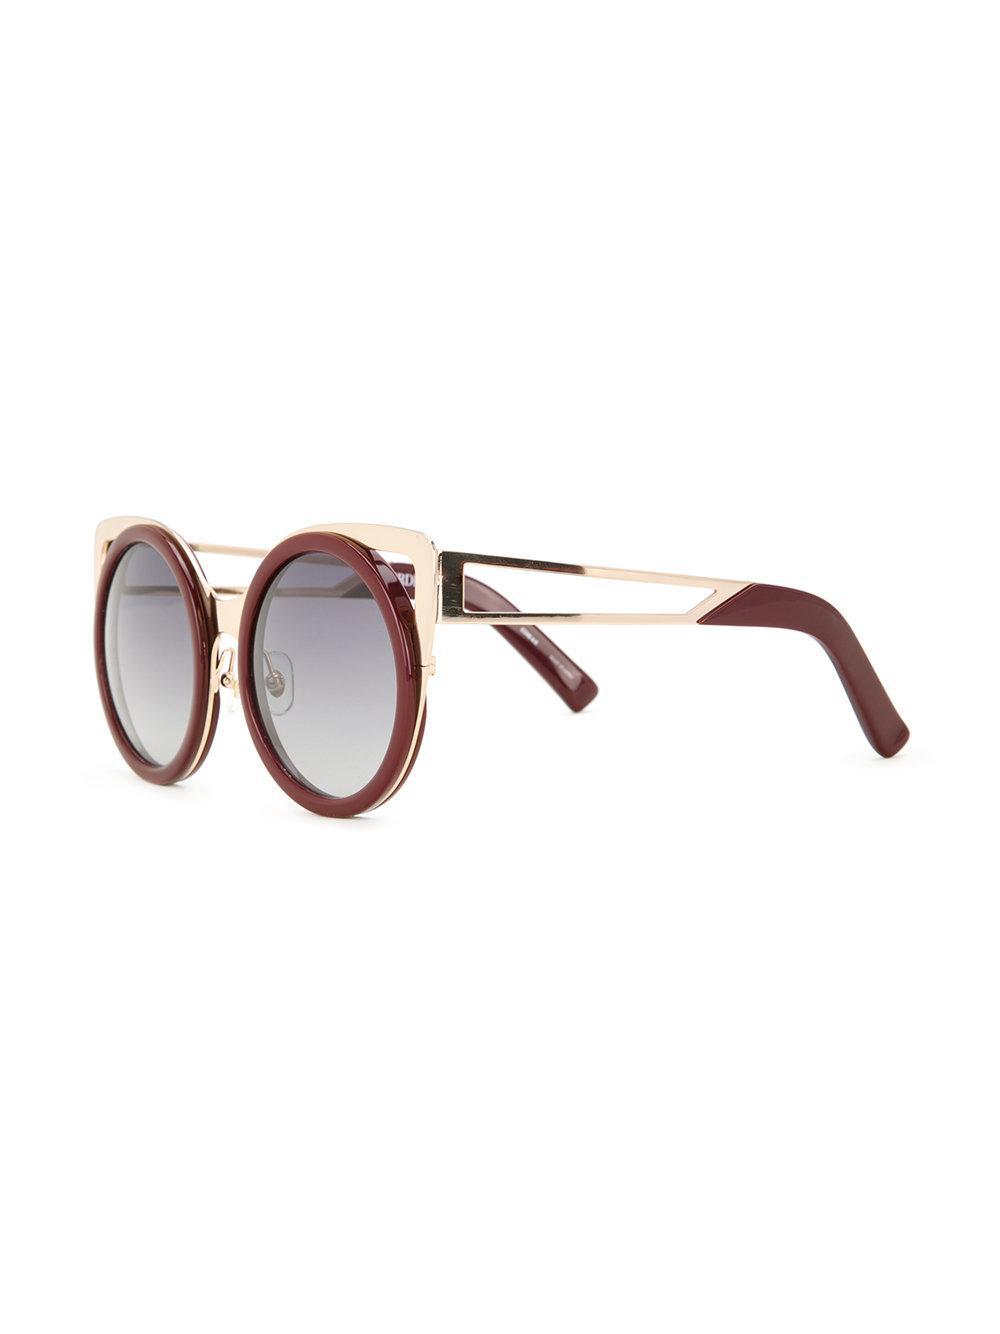 7e90dd14a72 Linda Farrow - Red Erdem 4 Sunglasses - Lyst. View fullscreen